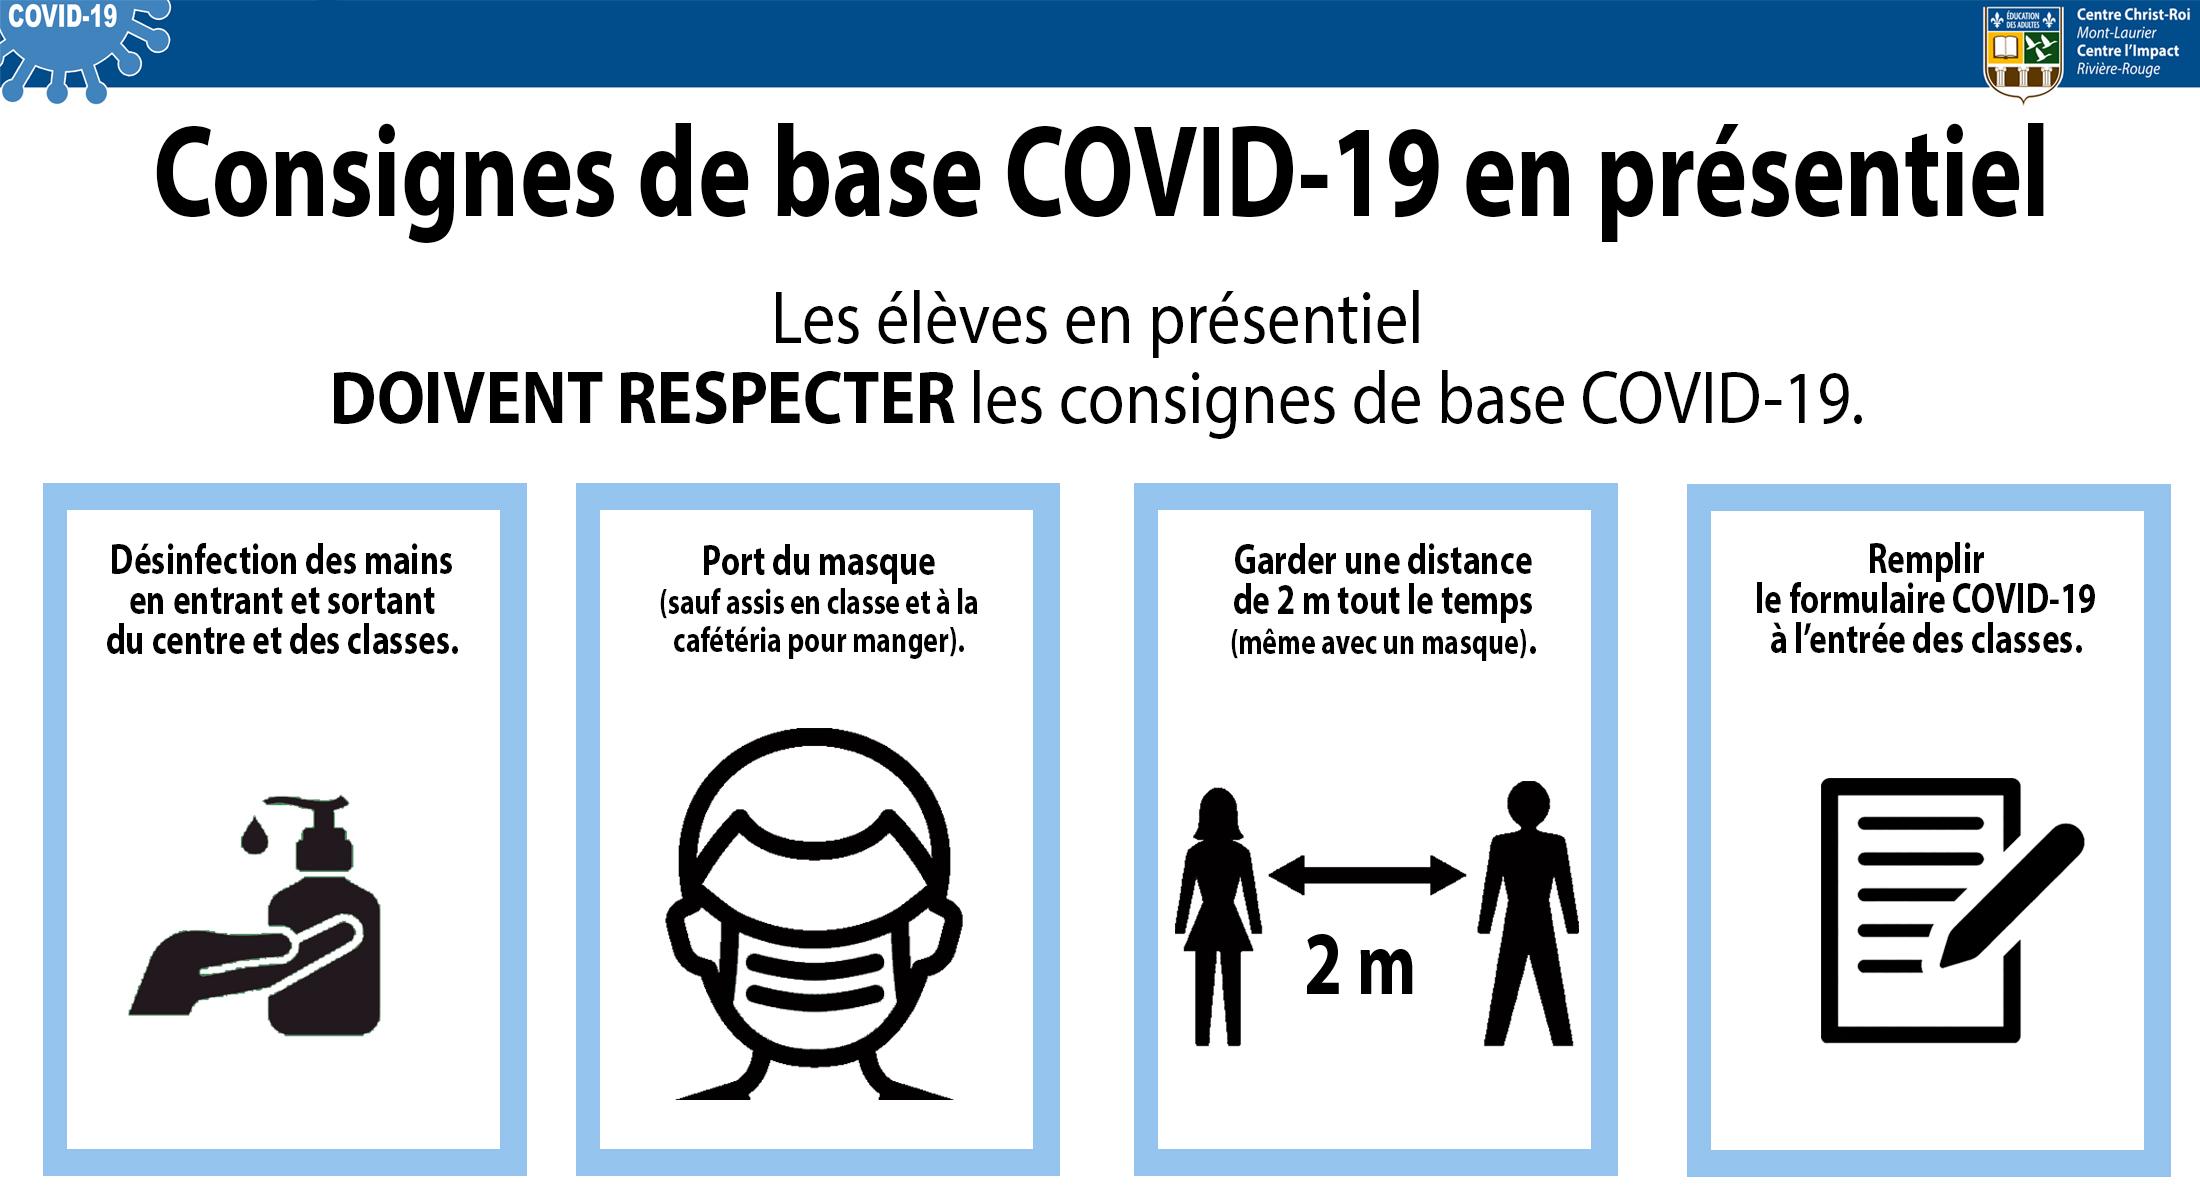 consignes de base Covid mars 2021 web